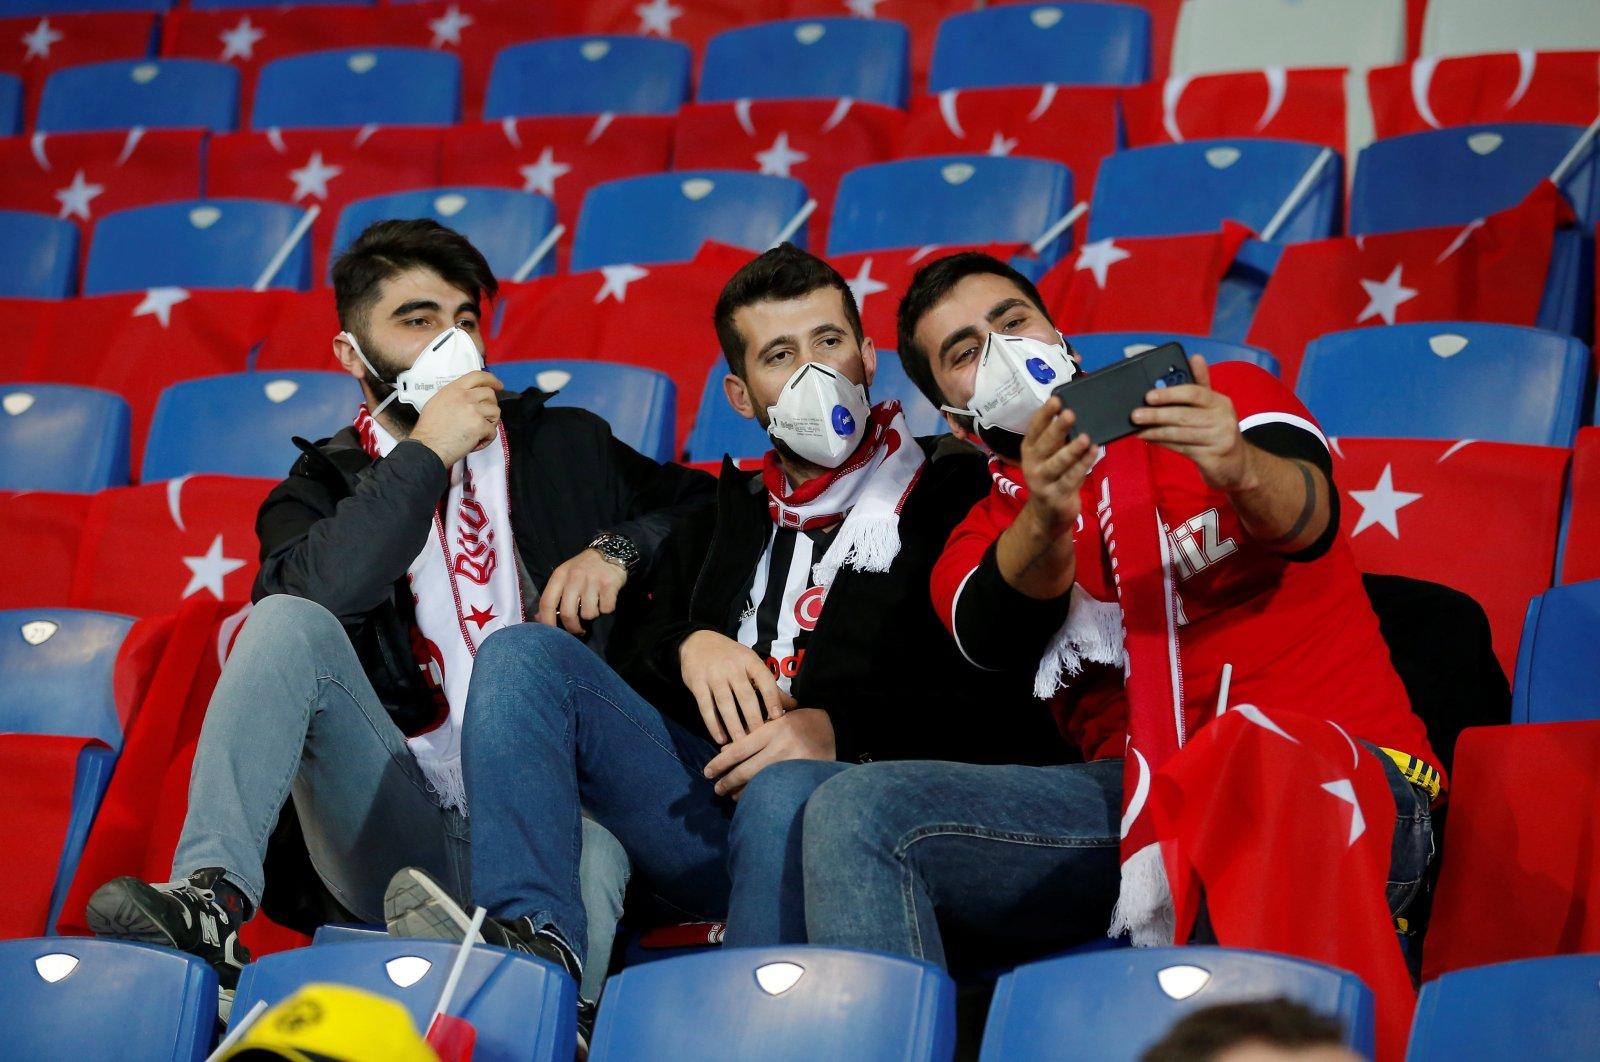 Istanbul Başakşehir fans wearing face masks inside the stadium before the Europa League Round of 16 First Leg game between Istanbul Başakşehir F.K. and FC Copenhagen in Başakşehir Fatih Terim Stadium, Istanbul, Turkey, March 12, 2020, as the number of coronavirus cases grow around the world. (Reuters Photo)